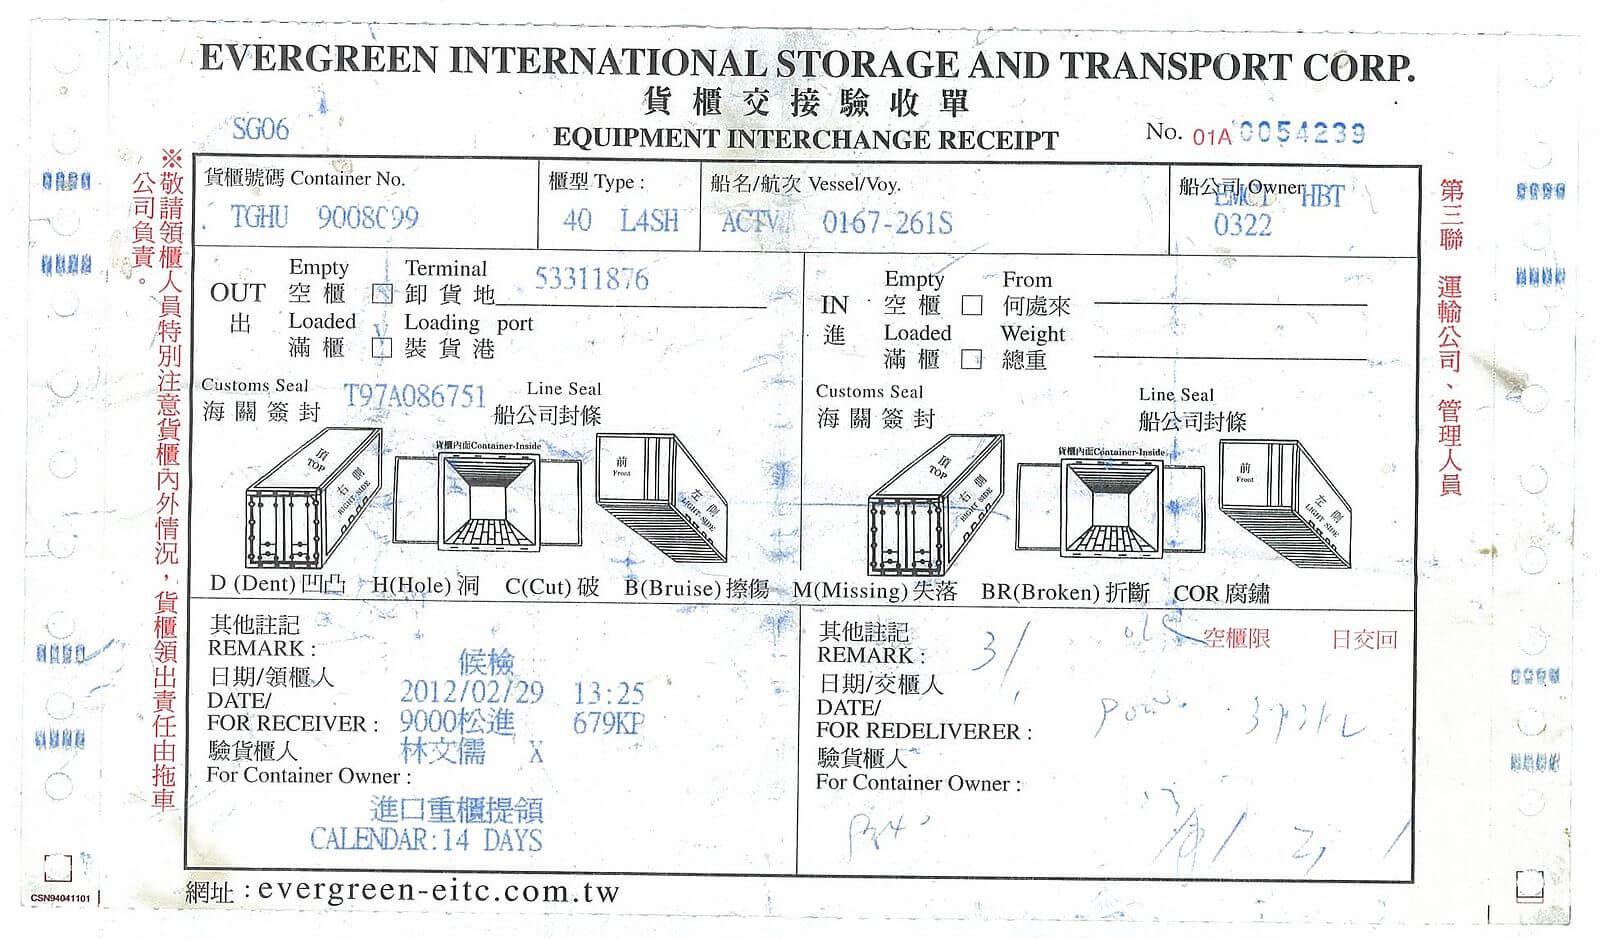 dokumen Equipment Interchage Recipt (EIR) shipping